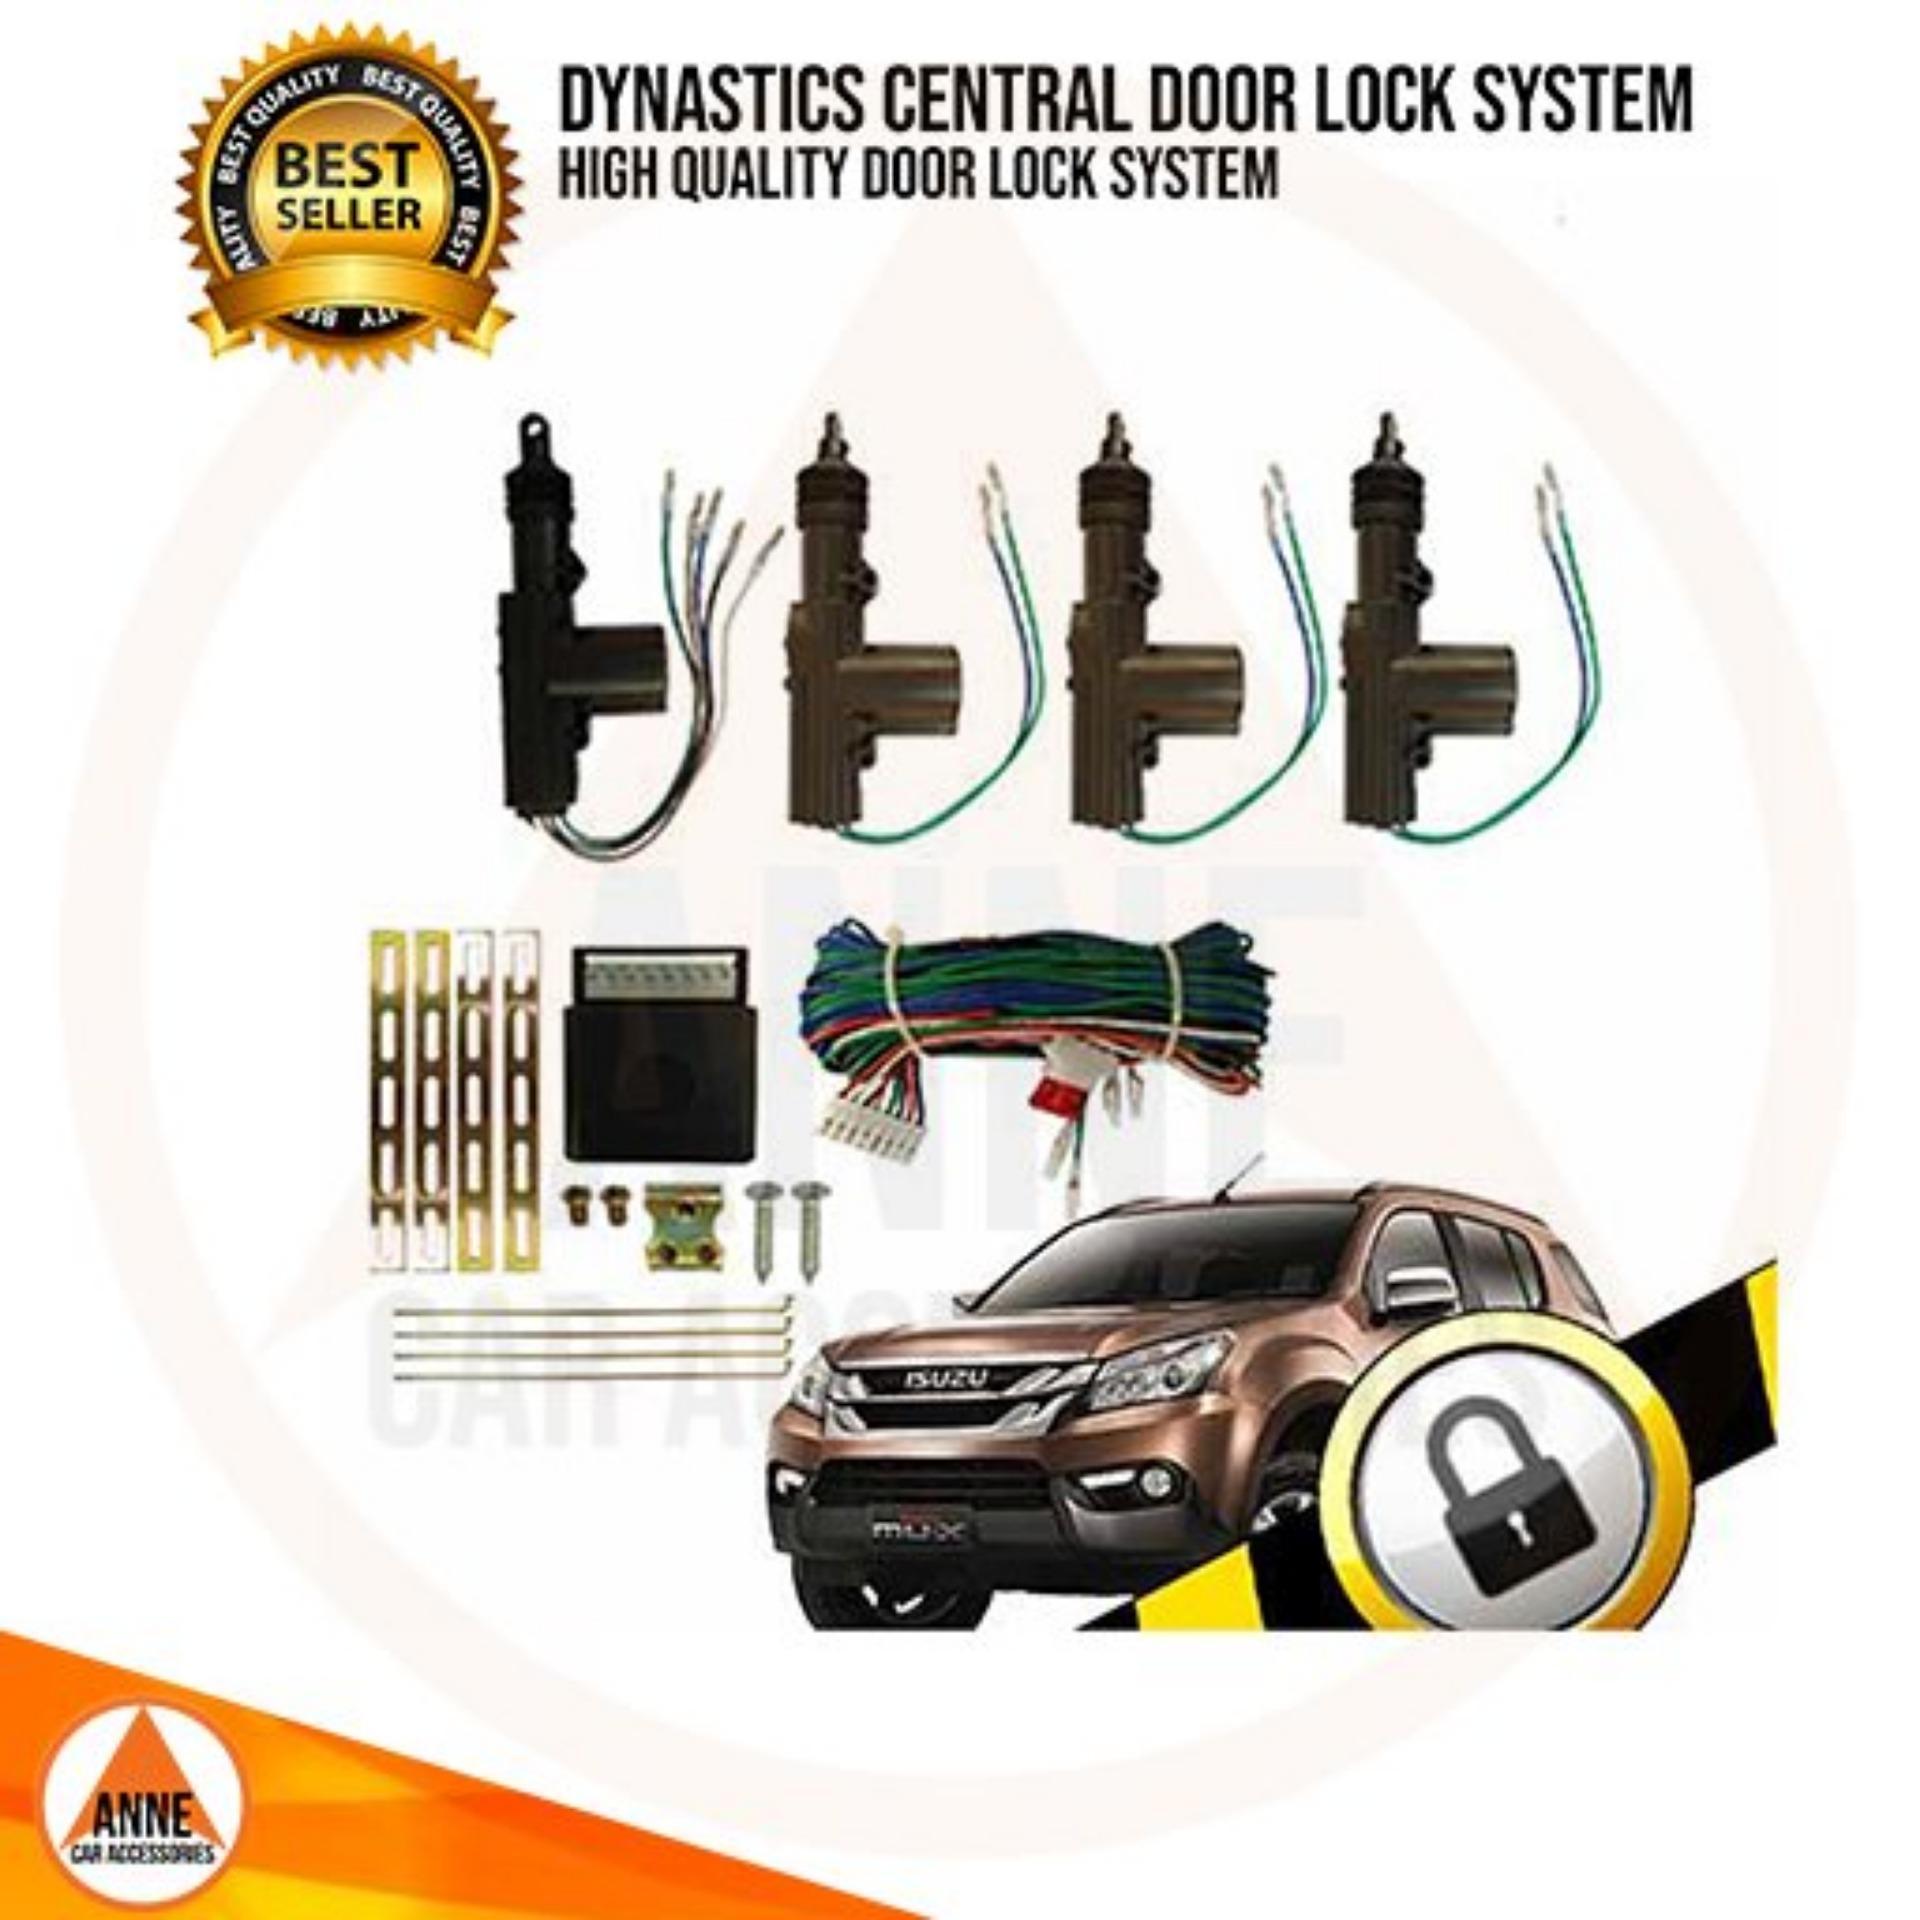 e5aaab35fe Dynastics 360º Heavy Duty Auto Car Key less Entry - Central Door Lock  System - Universal